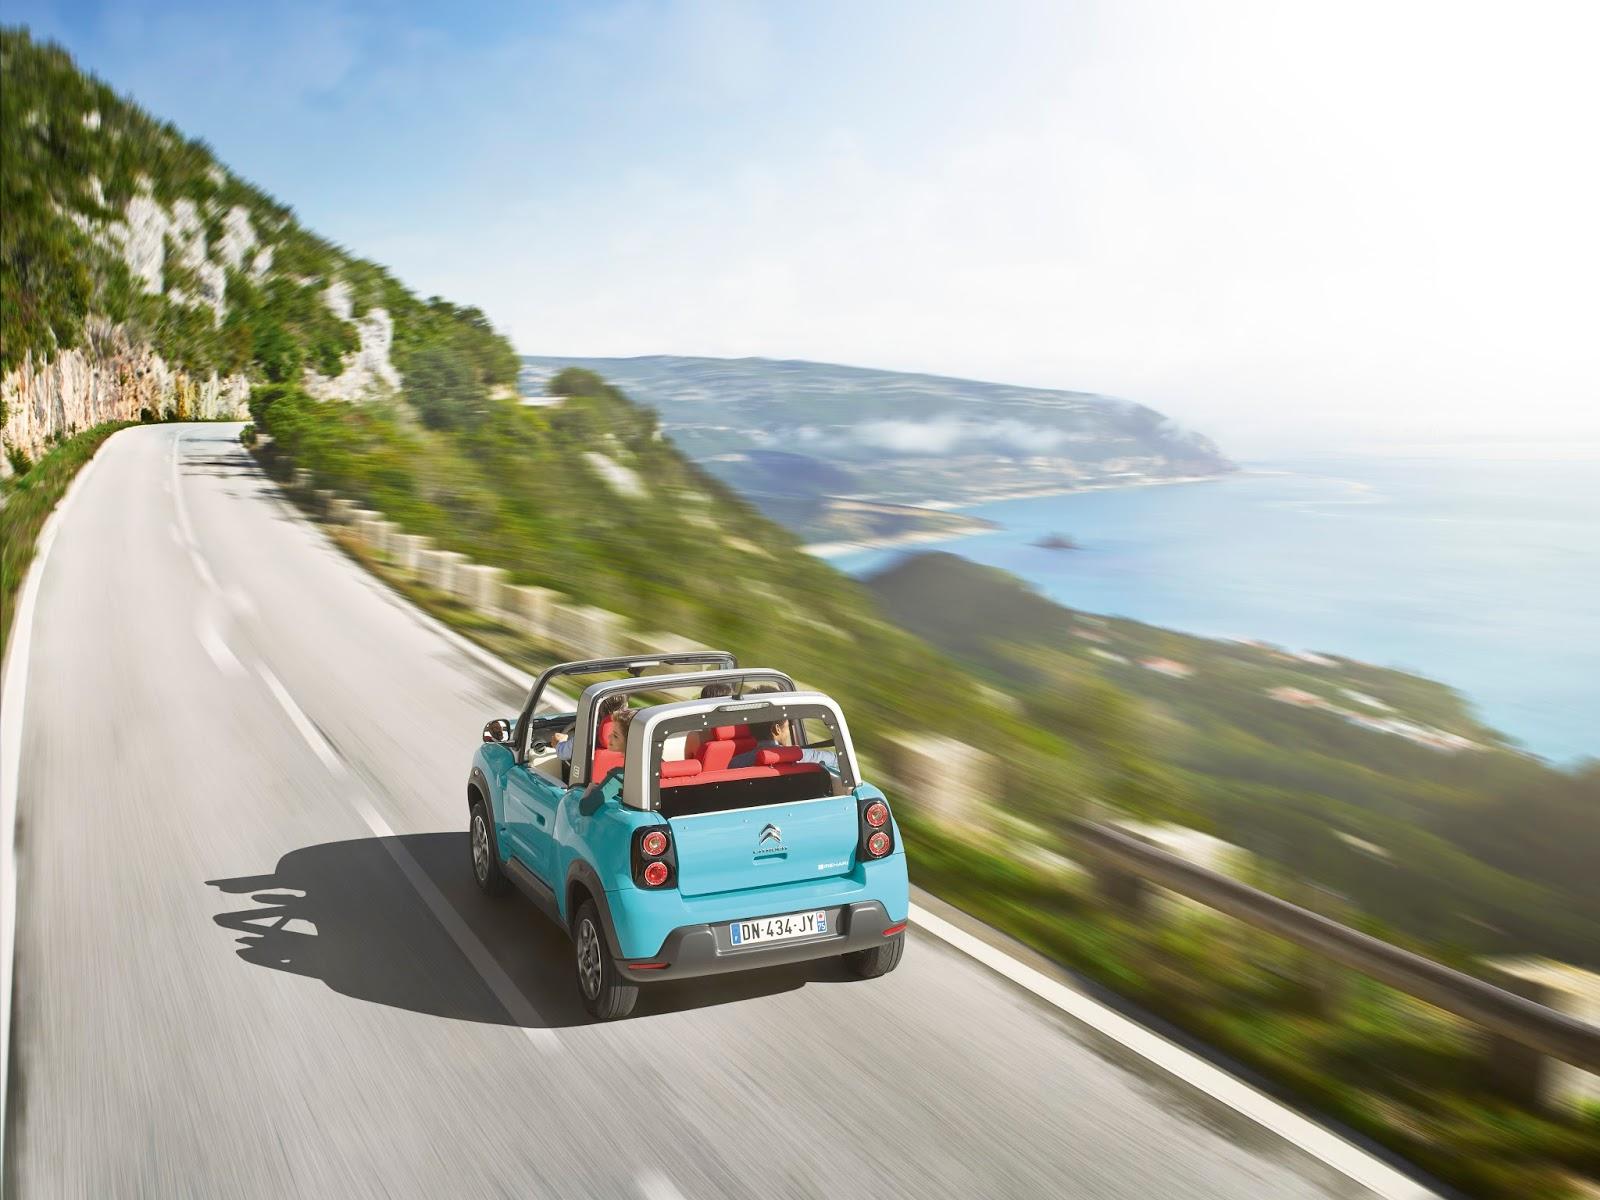 CL%2B16.005.008 Με 5 Παγκόσμιες Πρεμιέρες η Citroën Στο Σαλόνι Αυτοκινήτου της Γενεύης